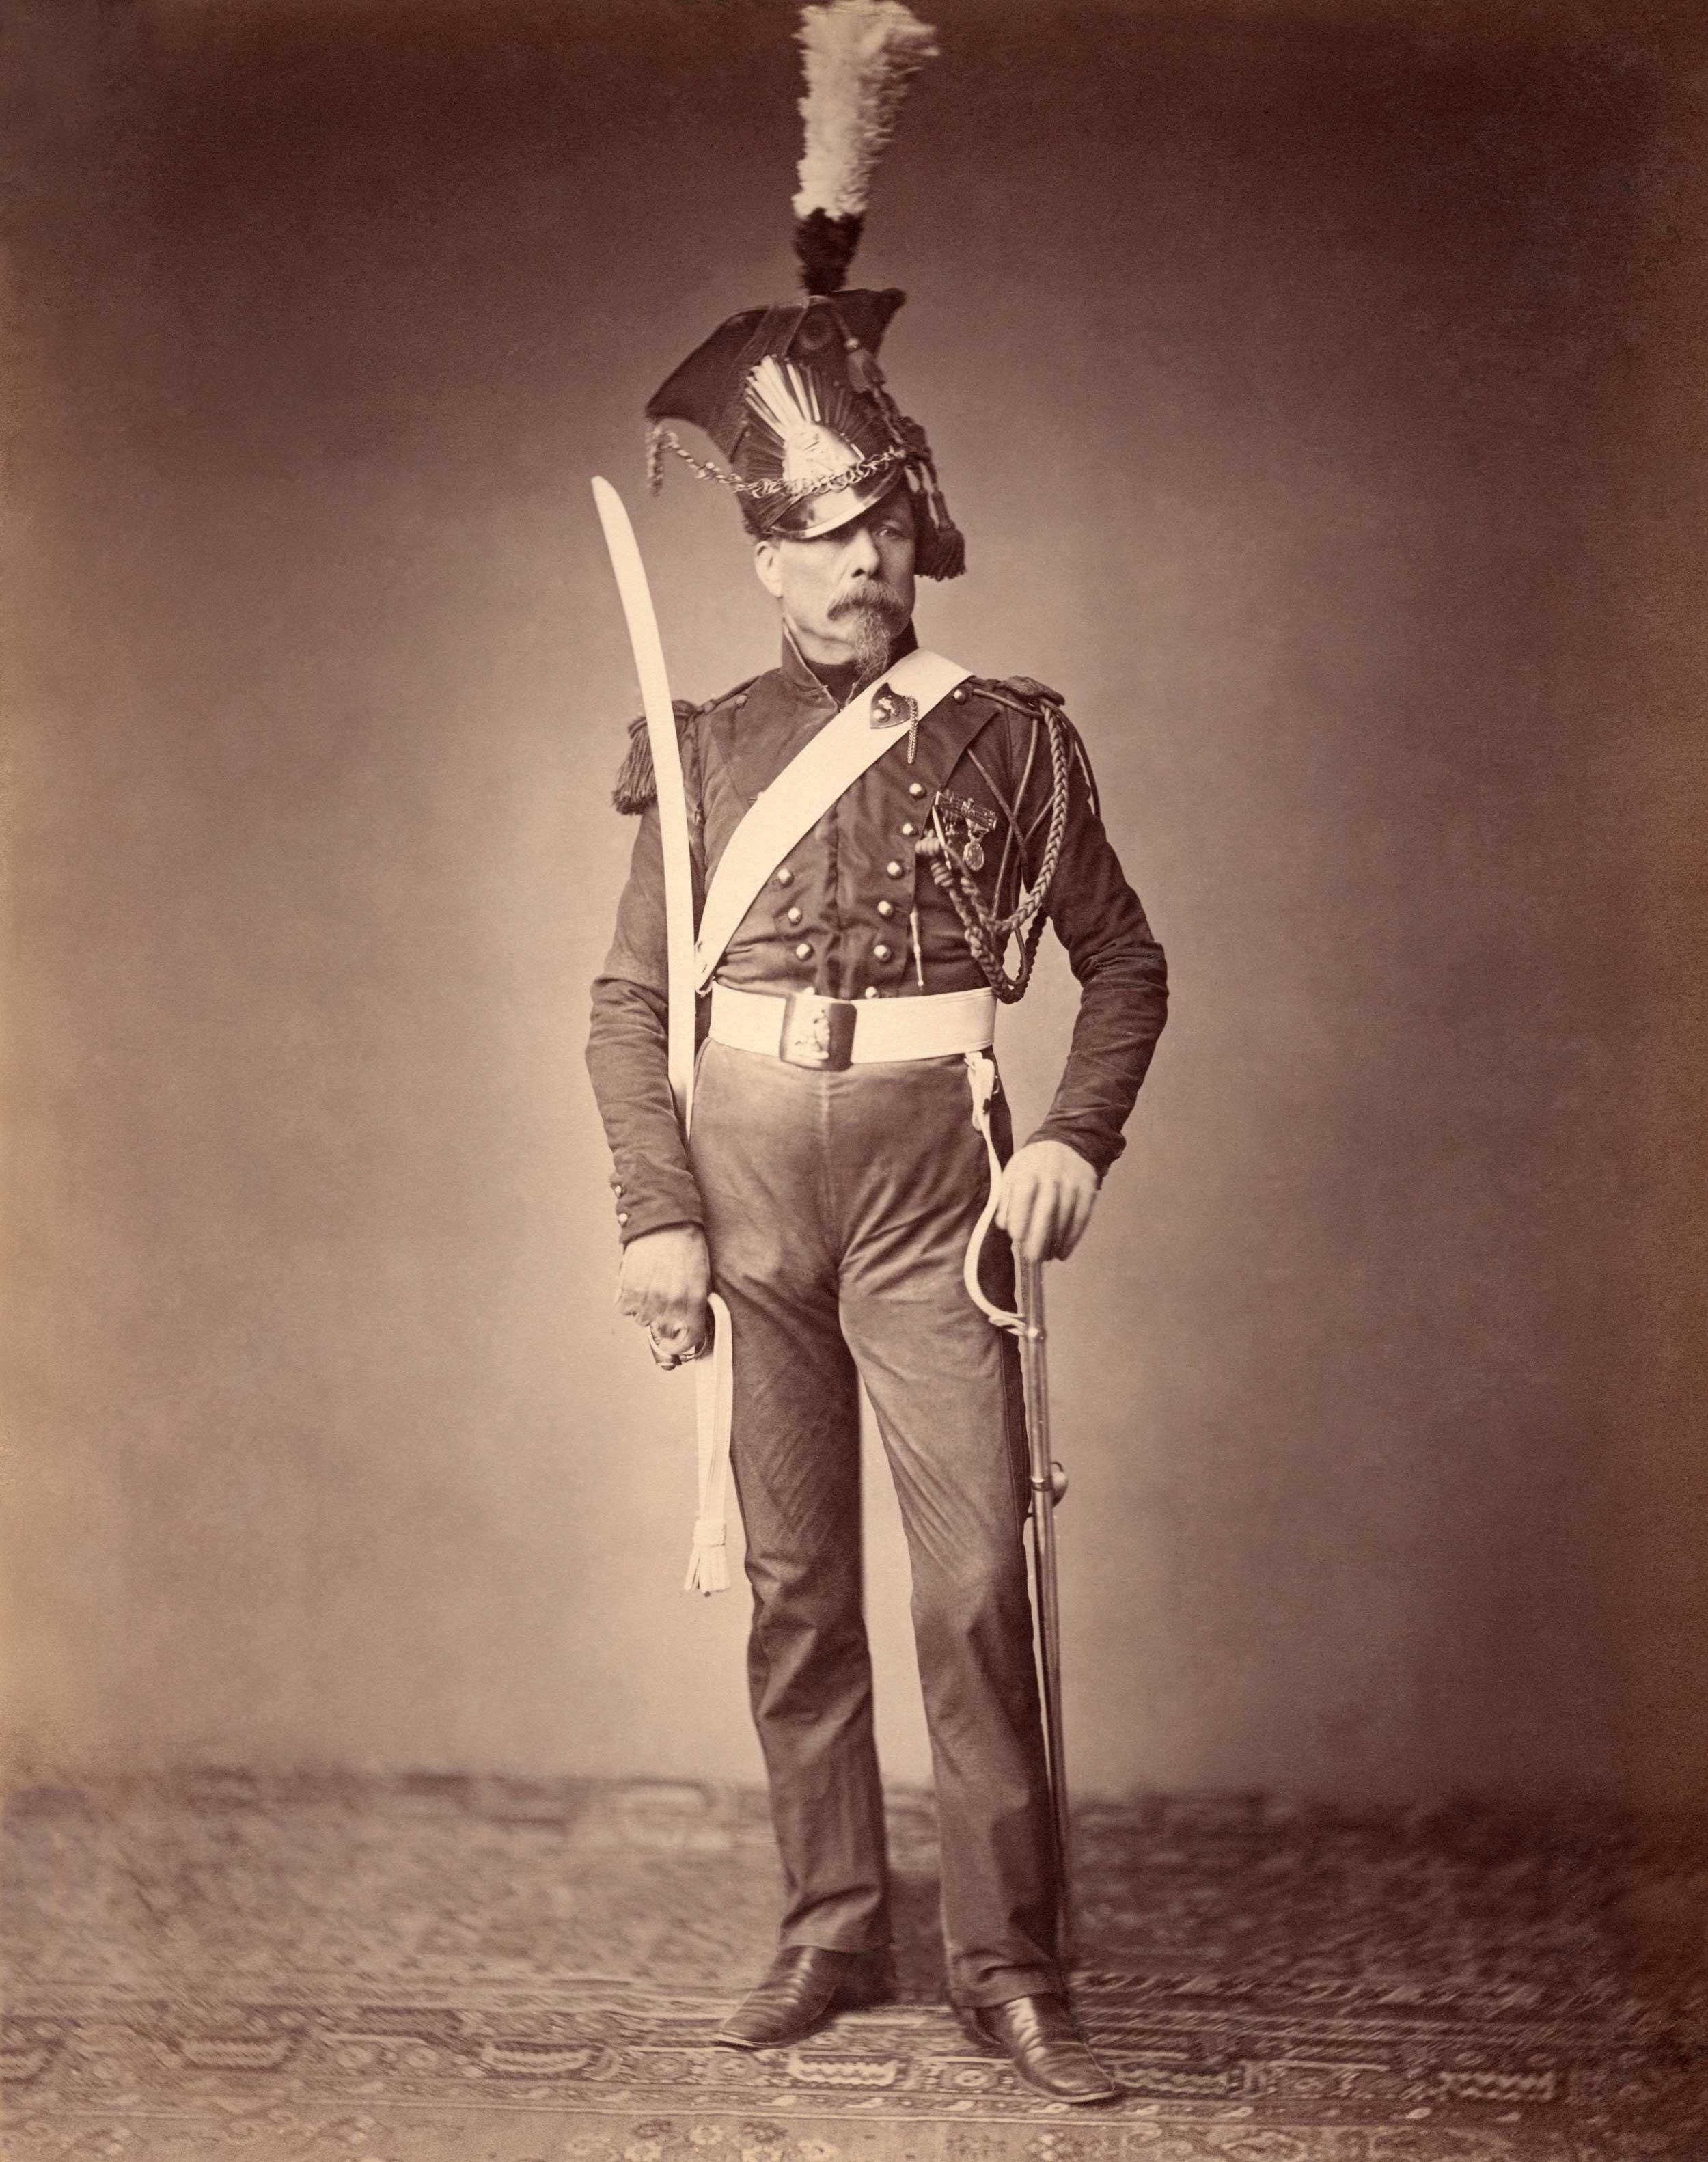 Monsieur Verlinde –2nd Guard Lancers 1815 or Trooper/ Lancer 2nd Chevau-legers-Lanciers de la Garde Imperiale